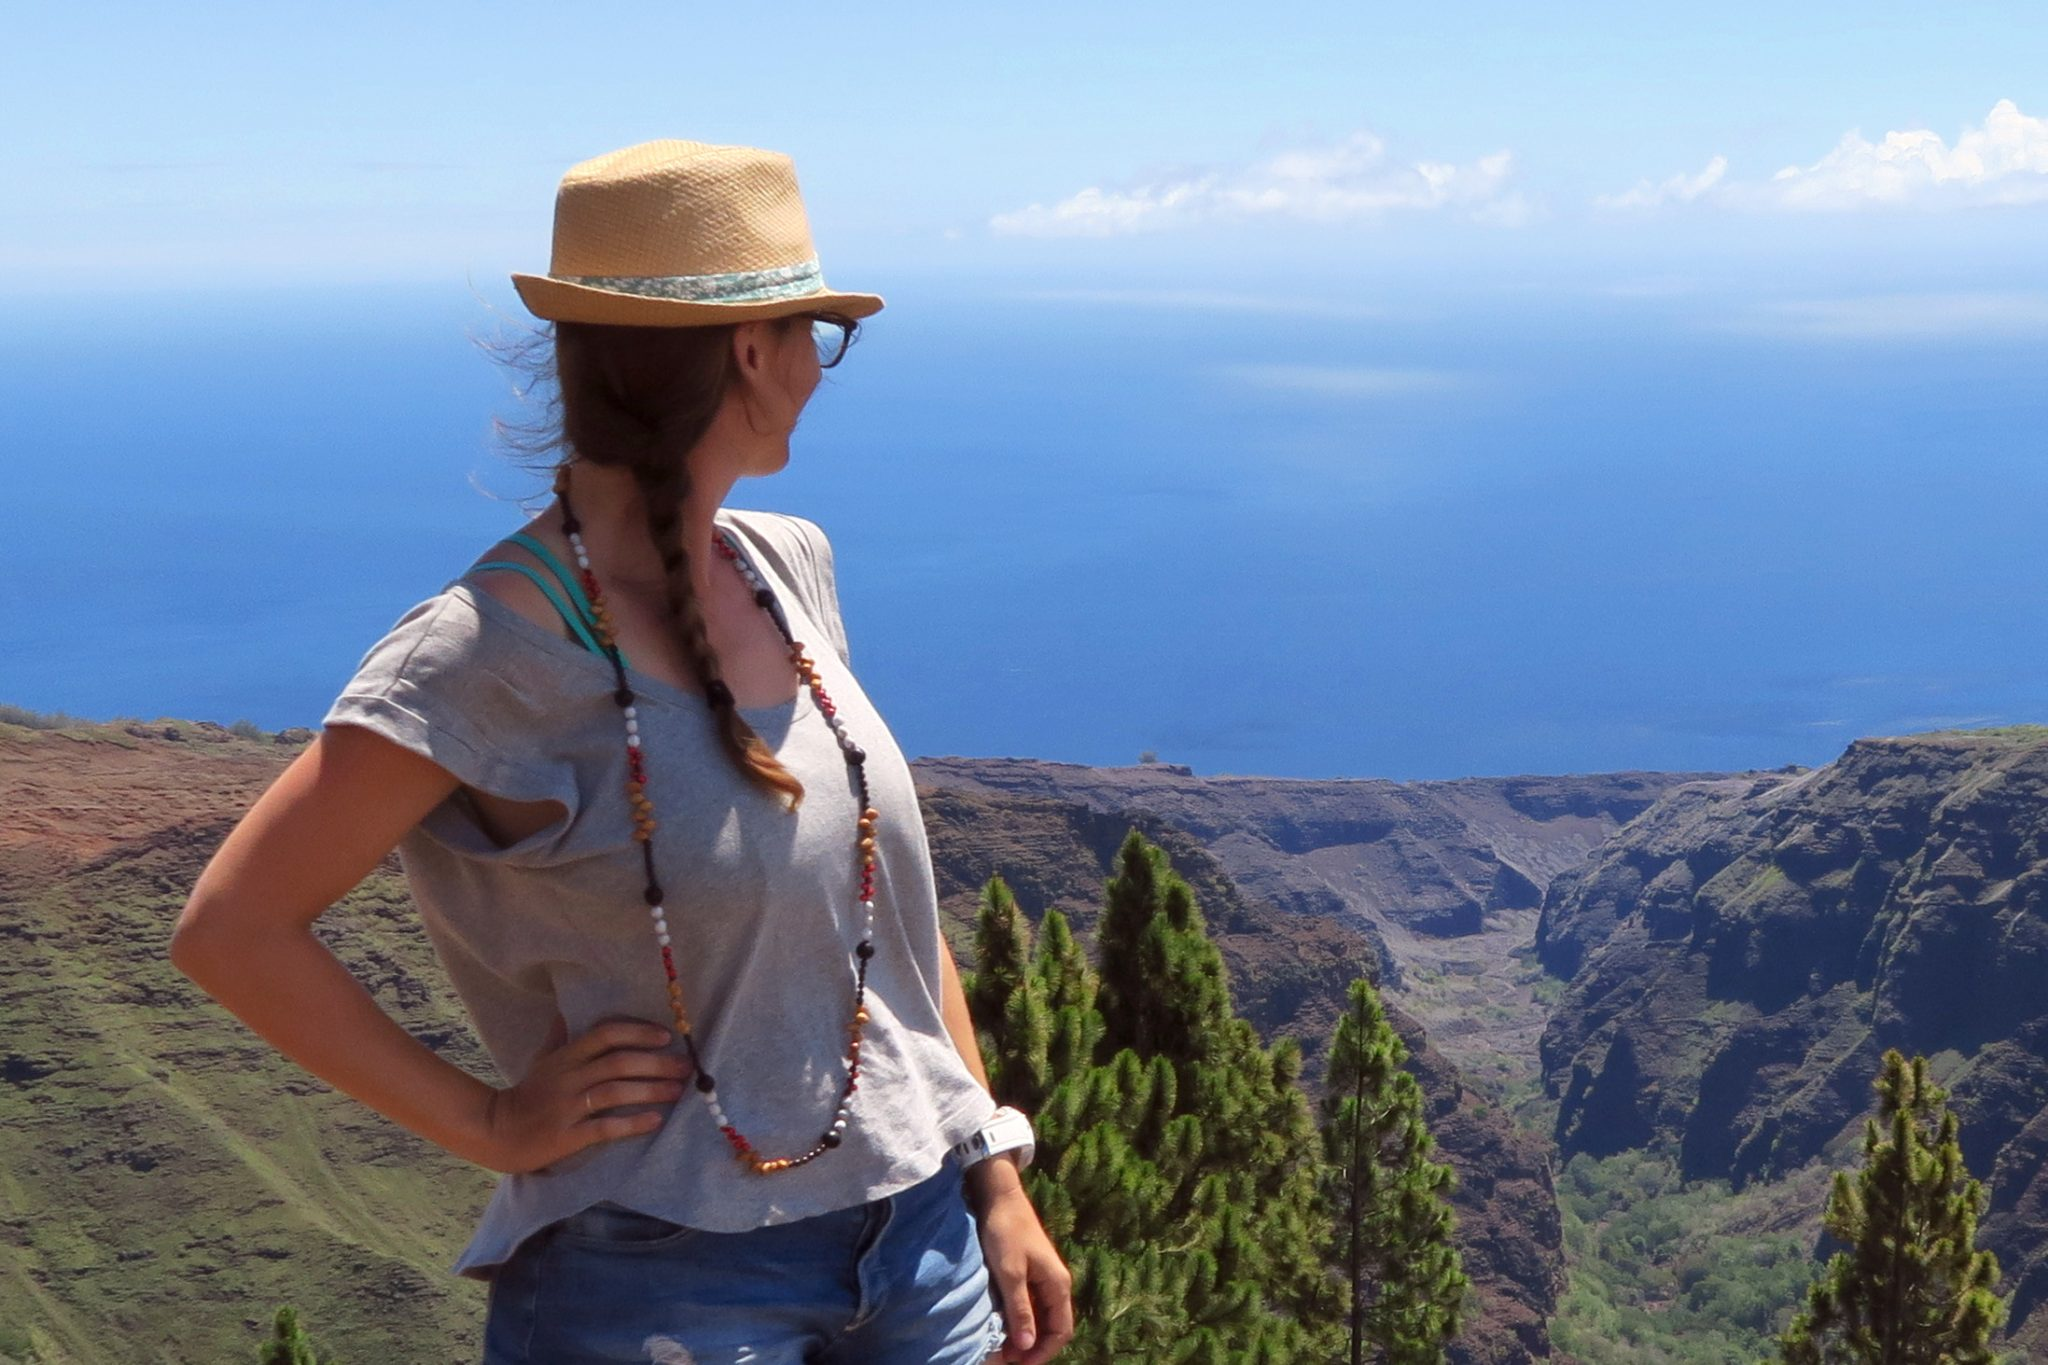 Grand Canyon Nuku Hiva Marquesas Islands French Polynesia